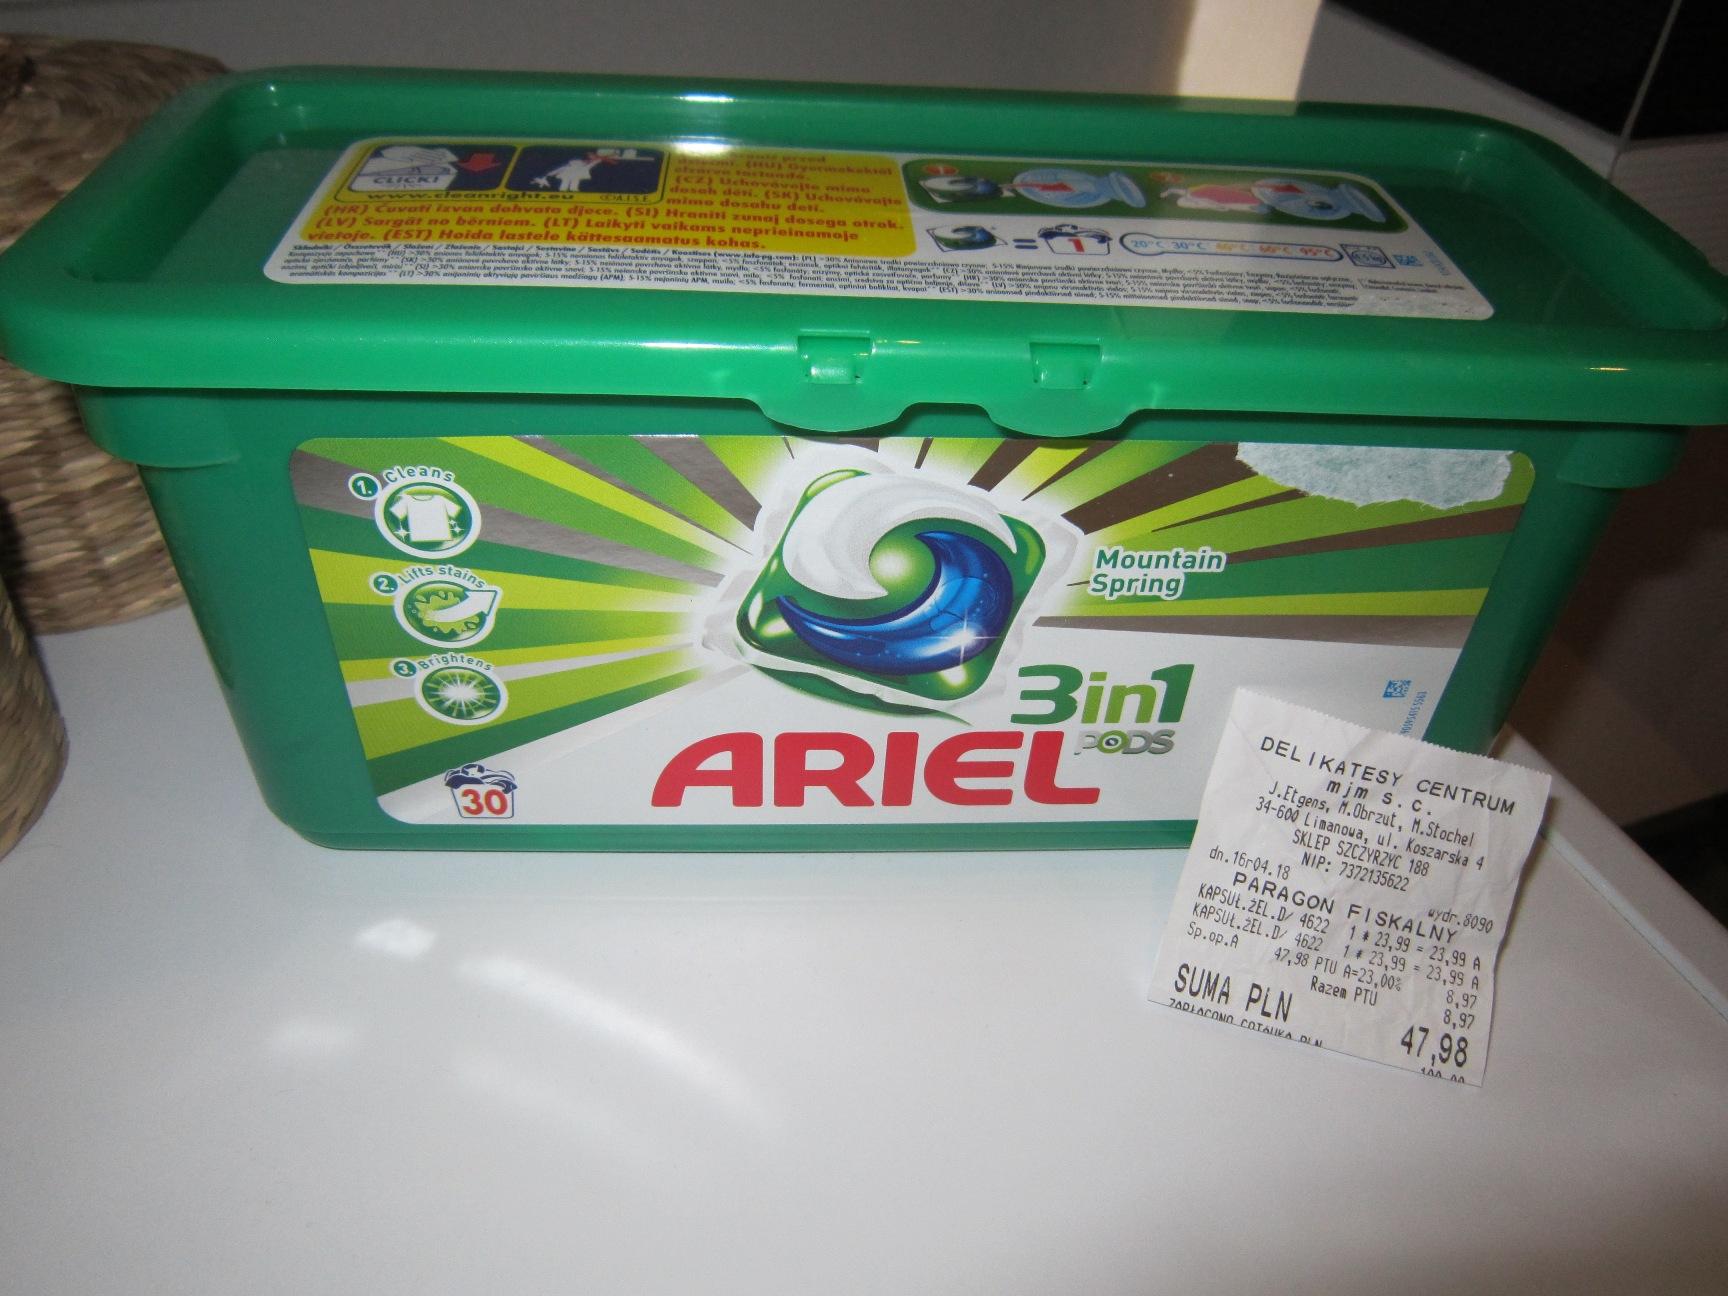 Kapsułki  do prania Ariel Mountain- Spring 3in1 30 szt za 23.99zł @ Delikatesy Centrum